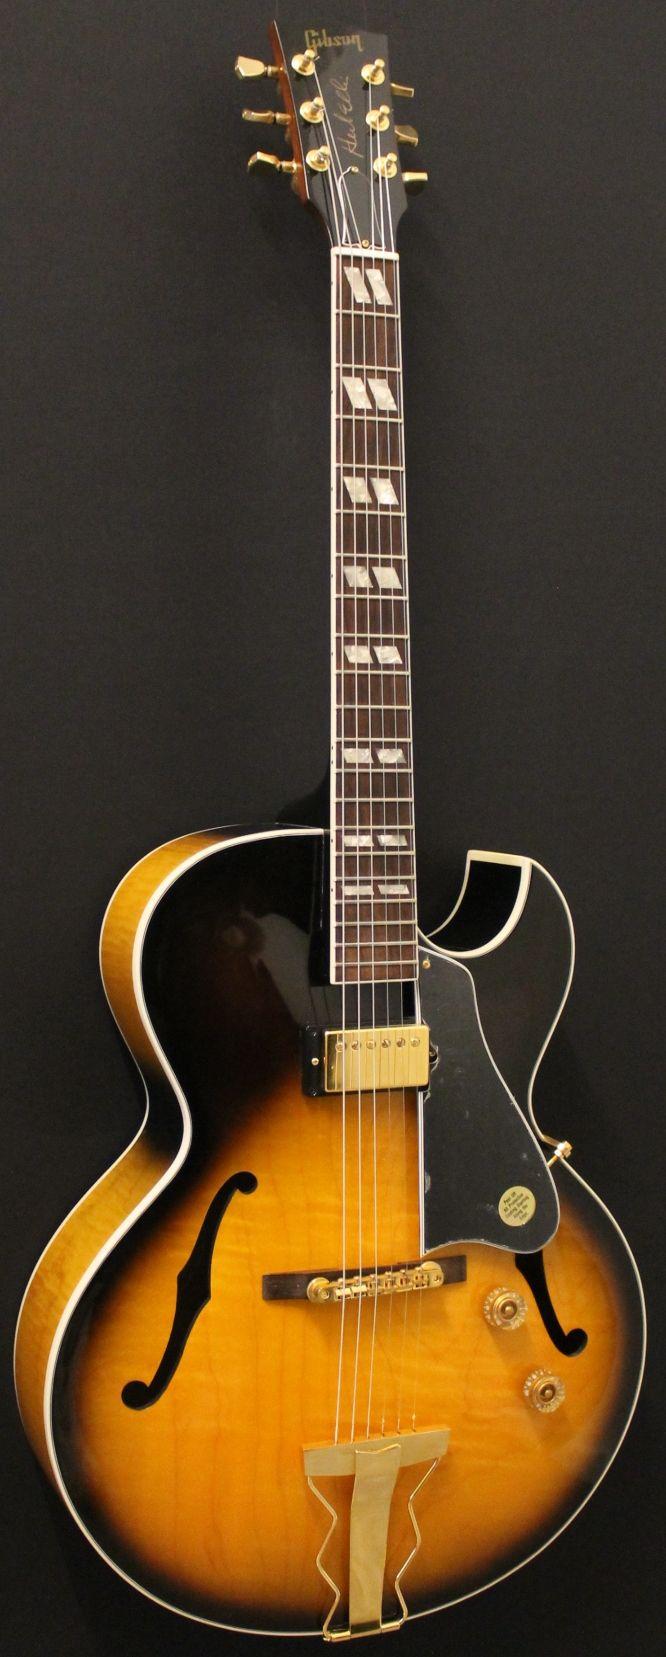 Gibson Es 165 Herb Ellis Signature 1999 Guitar For Sale Kitarakuu Guitars For Sale Guitar Archtop Guitar